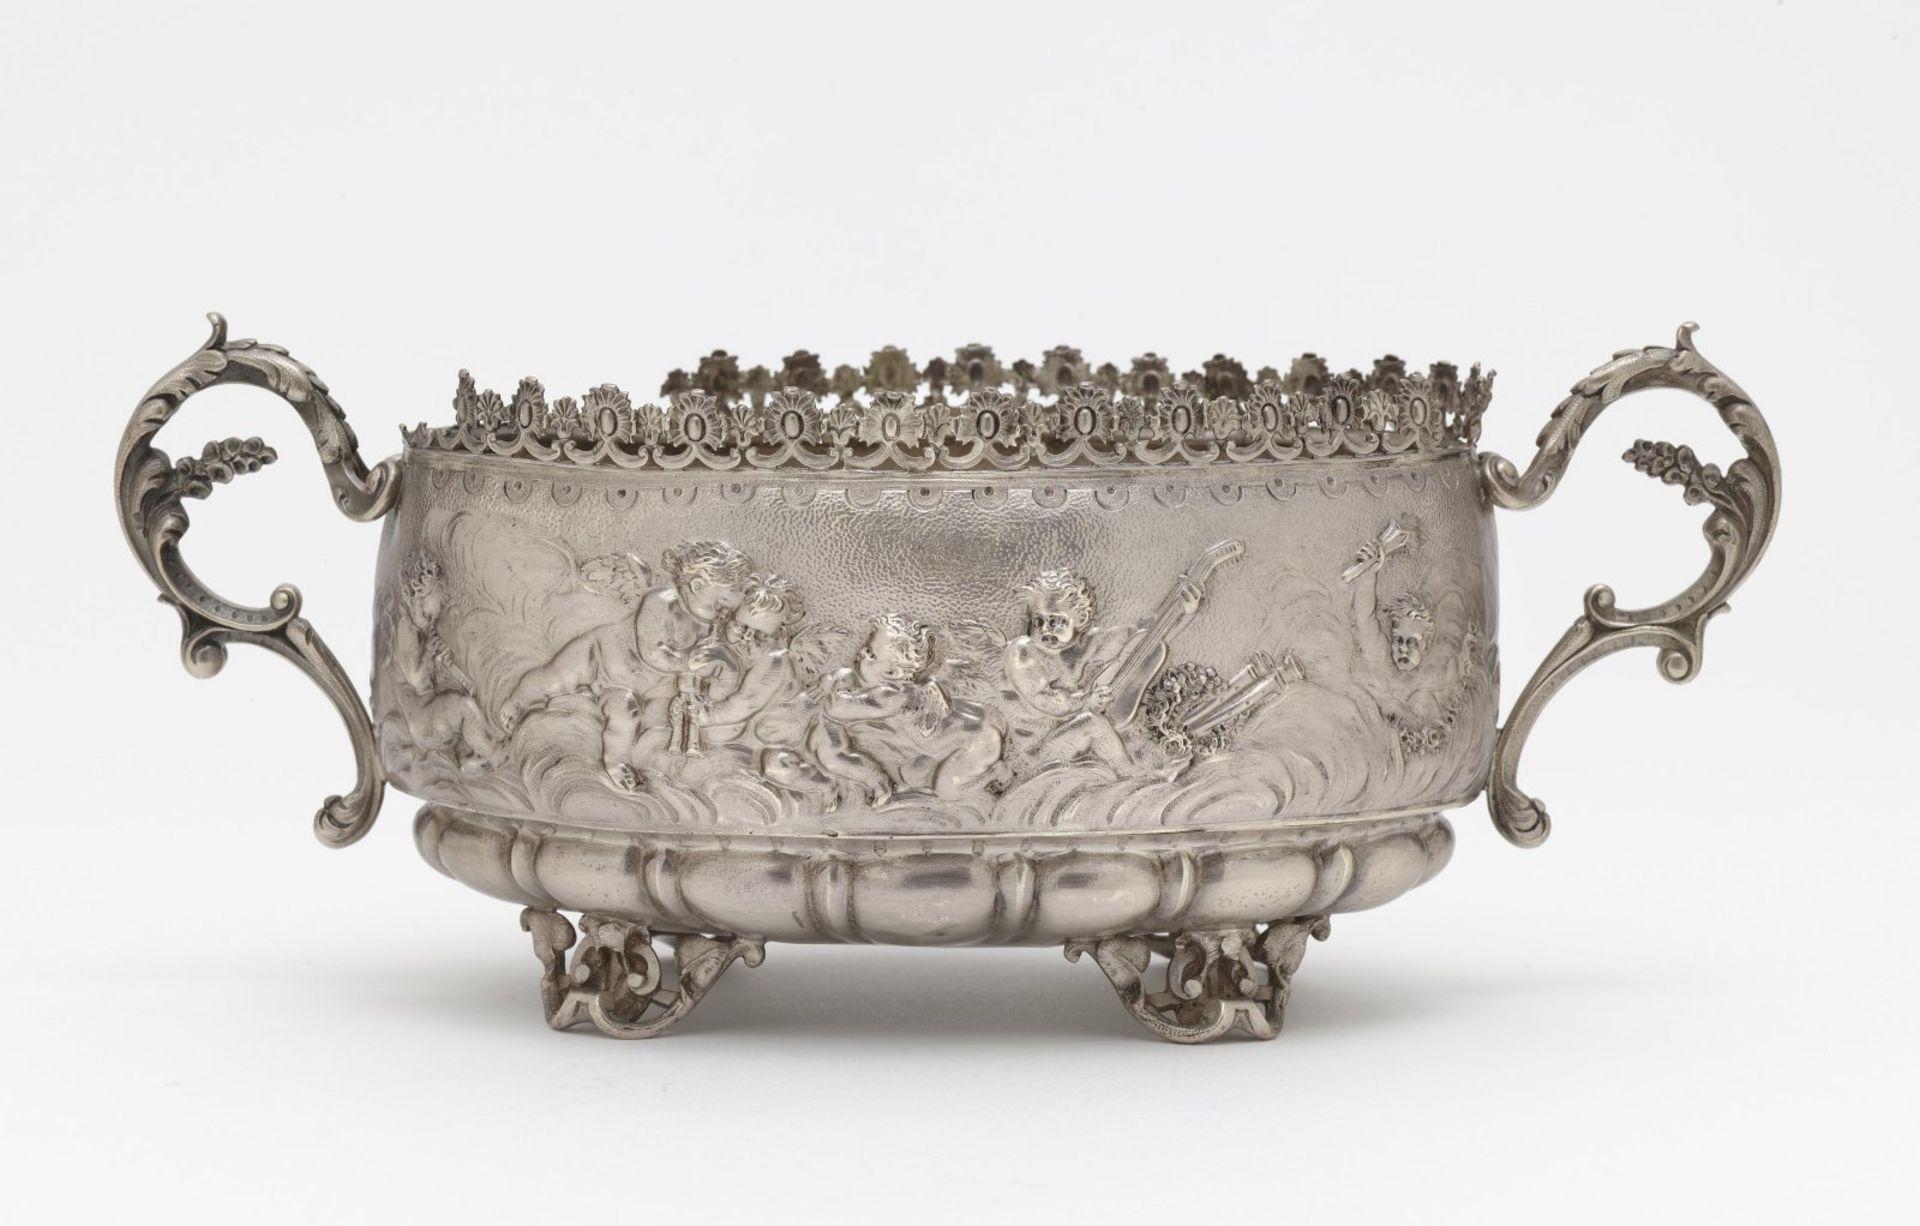 An oval handled bowl